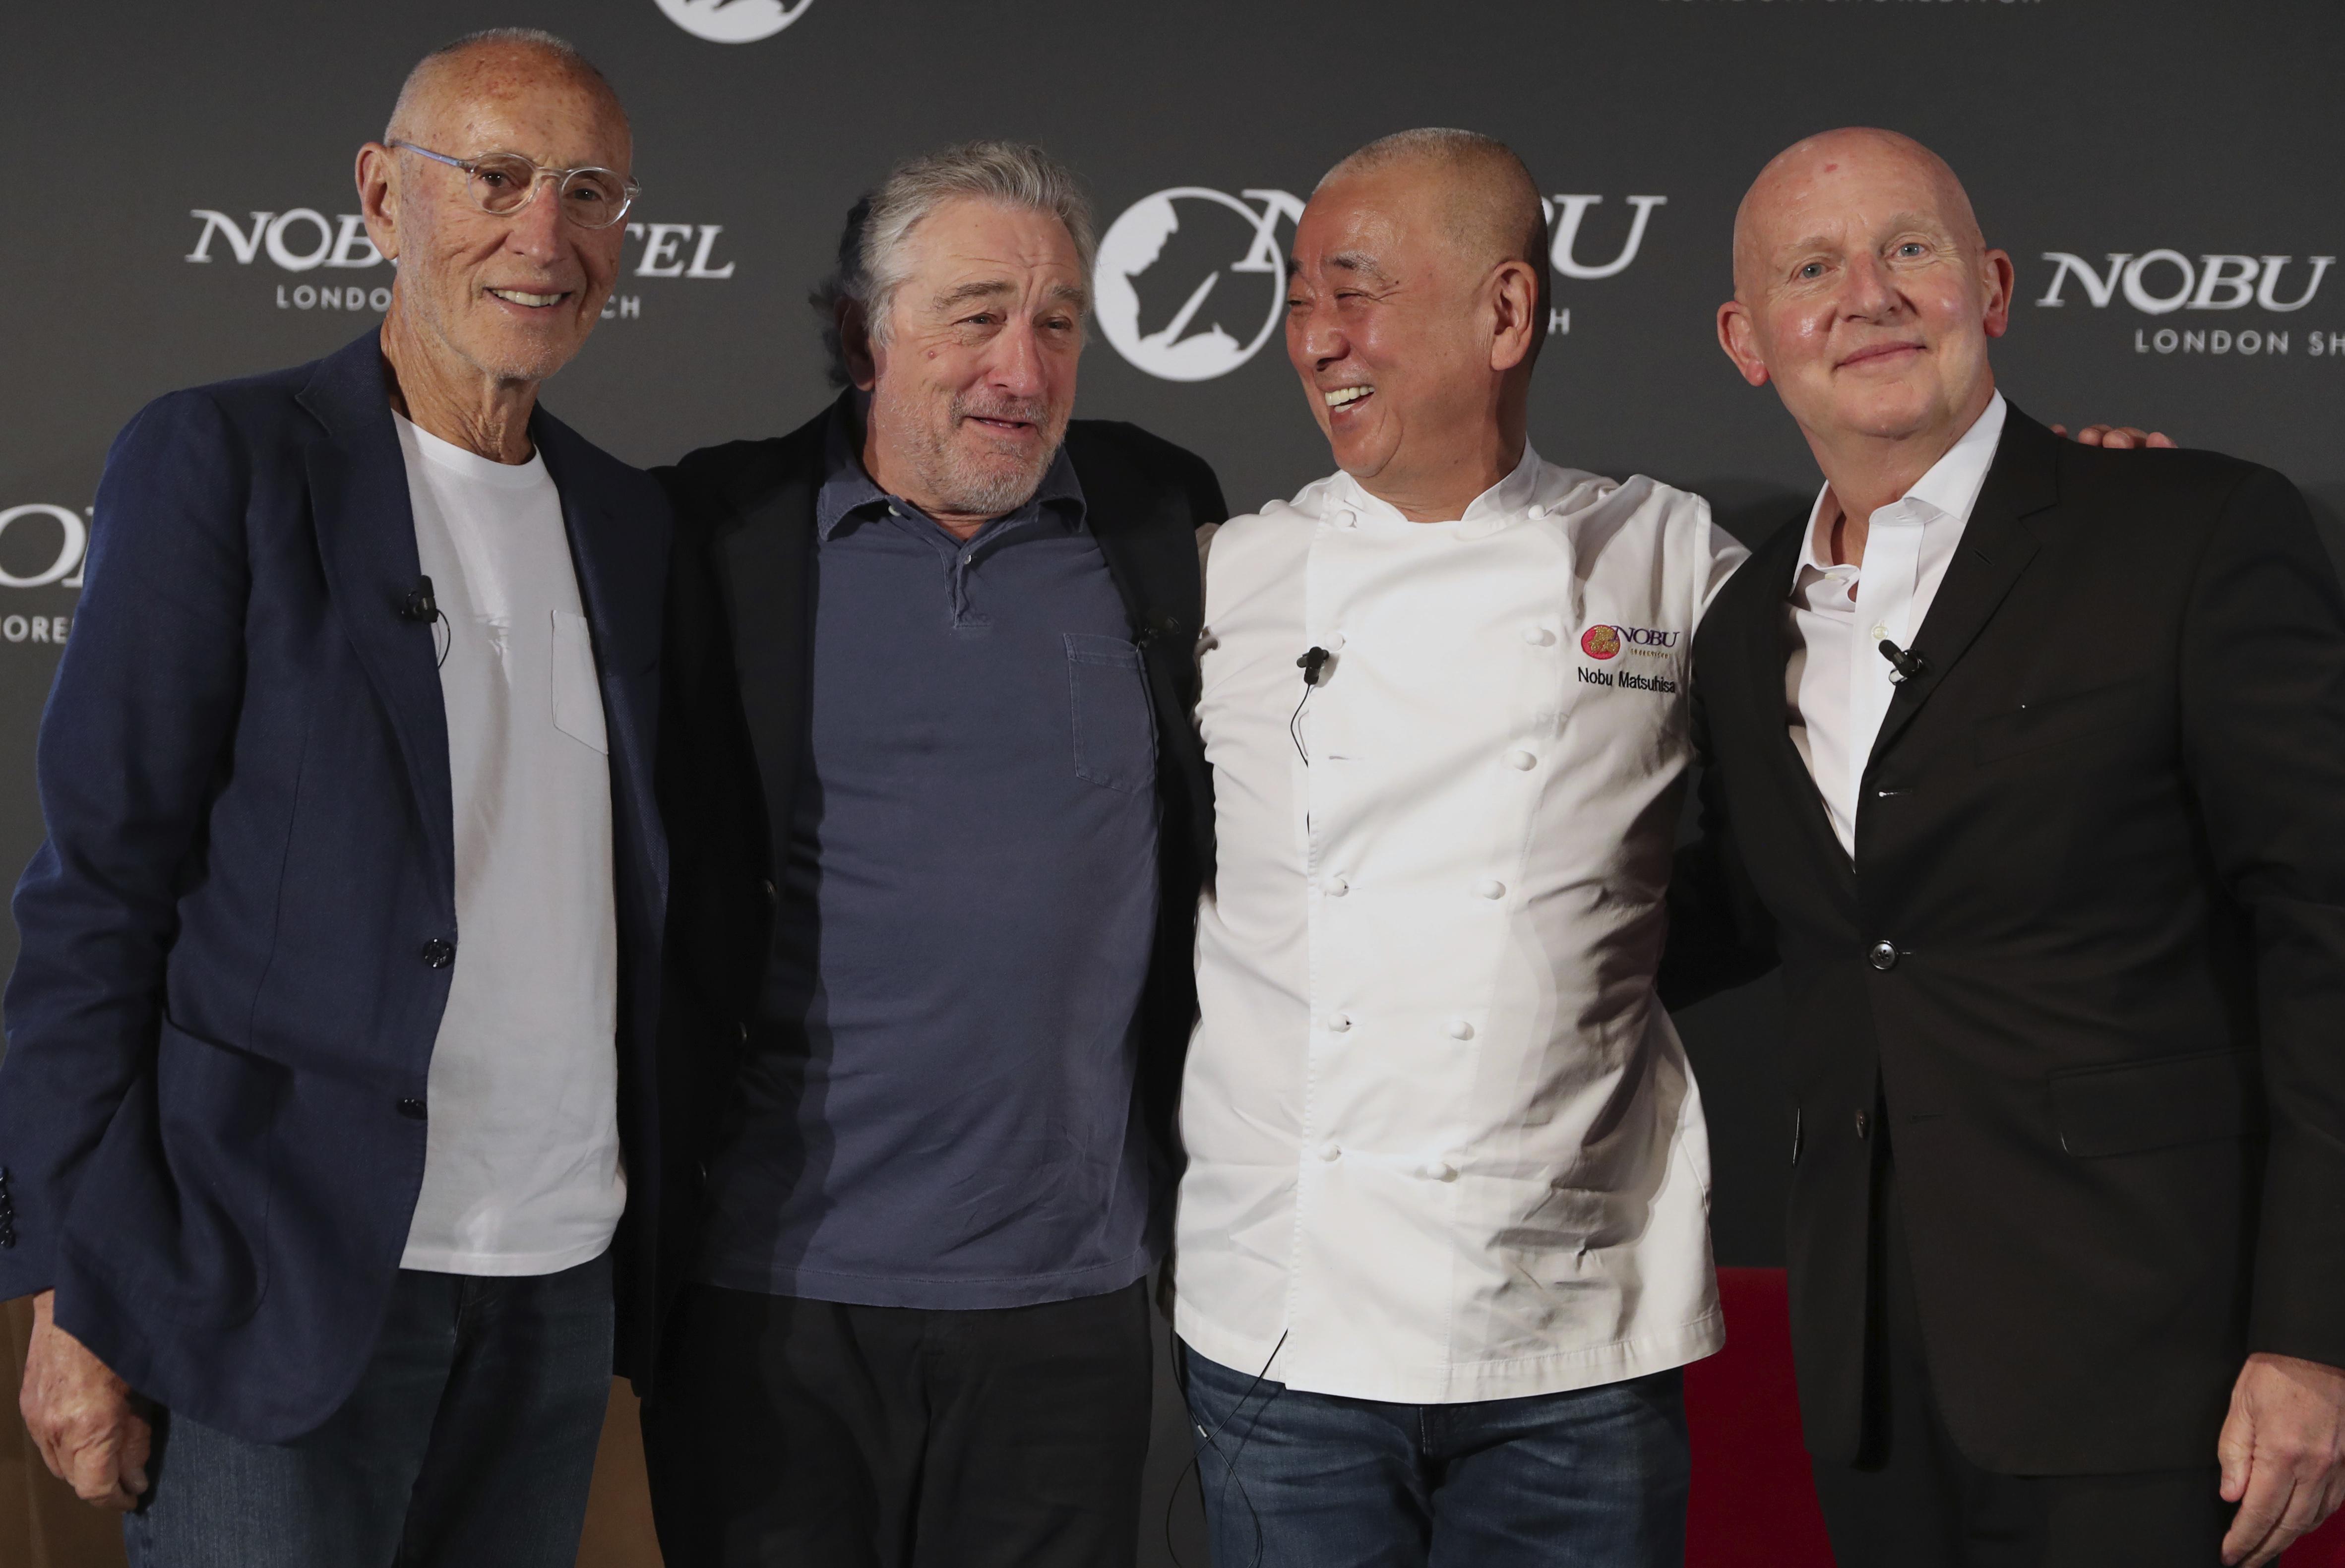 L-R: Meir Teper, Robert De Niro, Nobu Matsuhisa and Trevor Horwell. Credit: PA